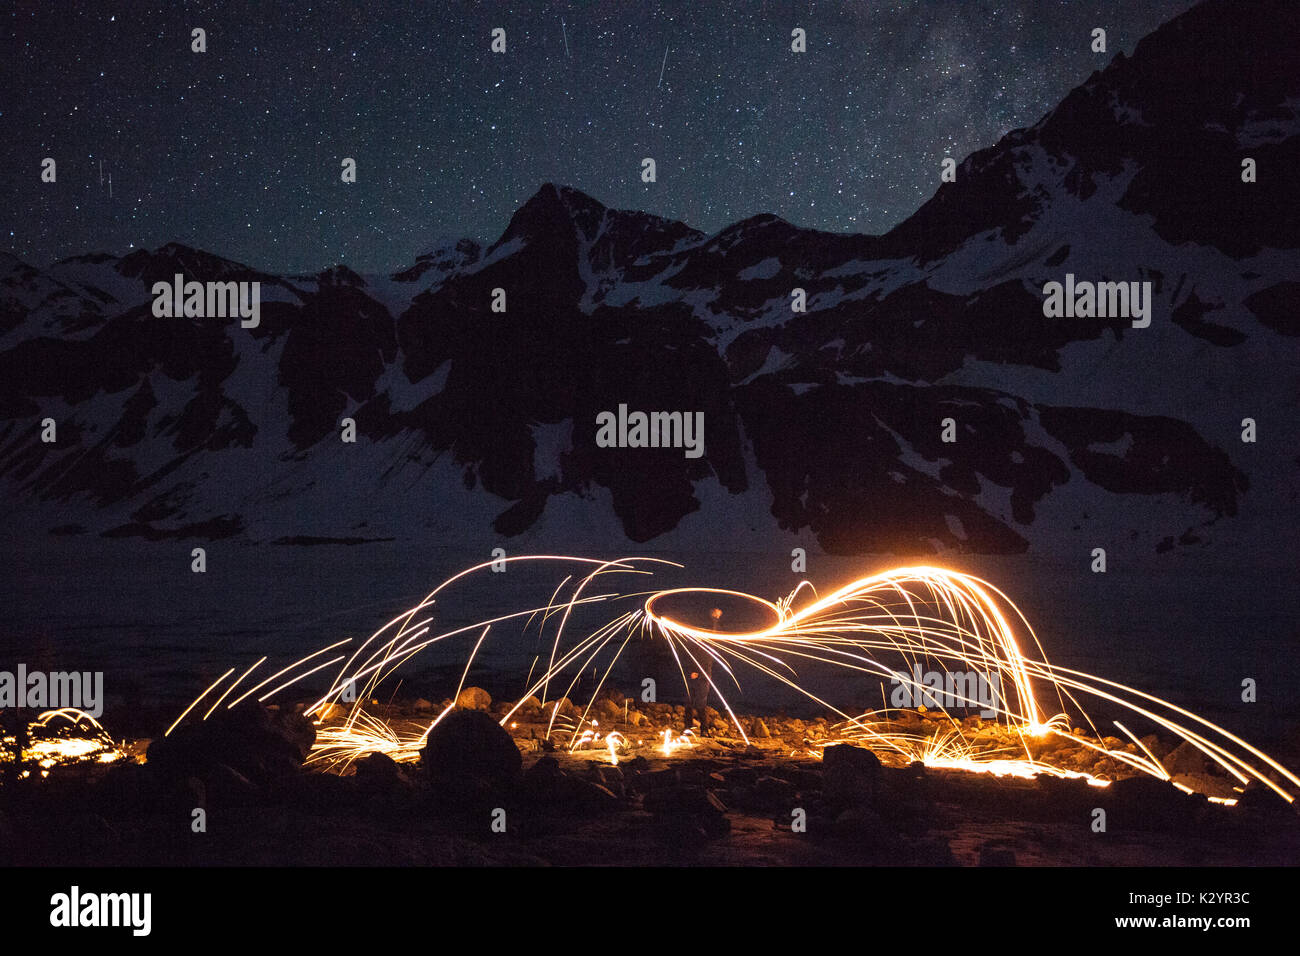 Iluminar la noche, Garibaldi Provincial Park, A.C. Imagen De Stock